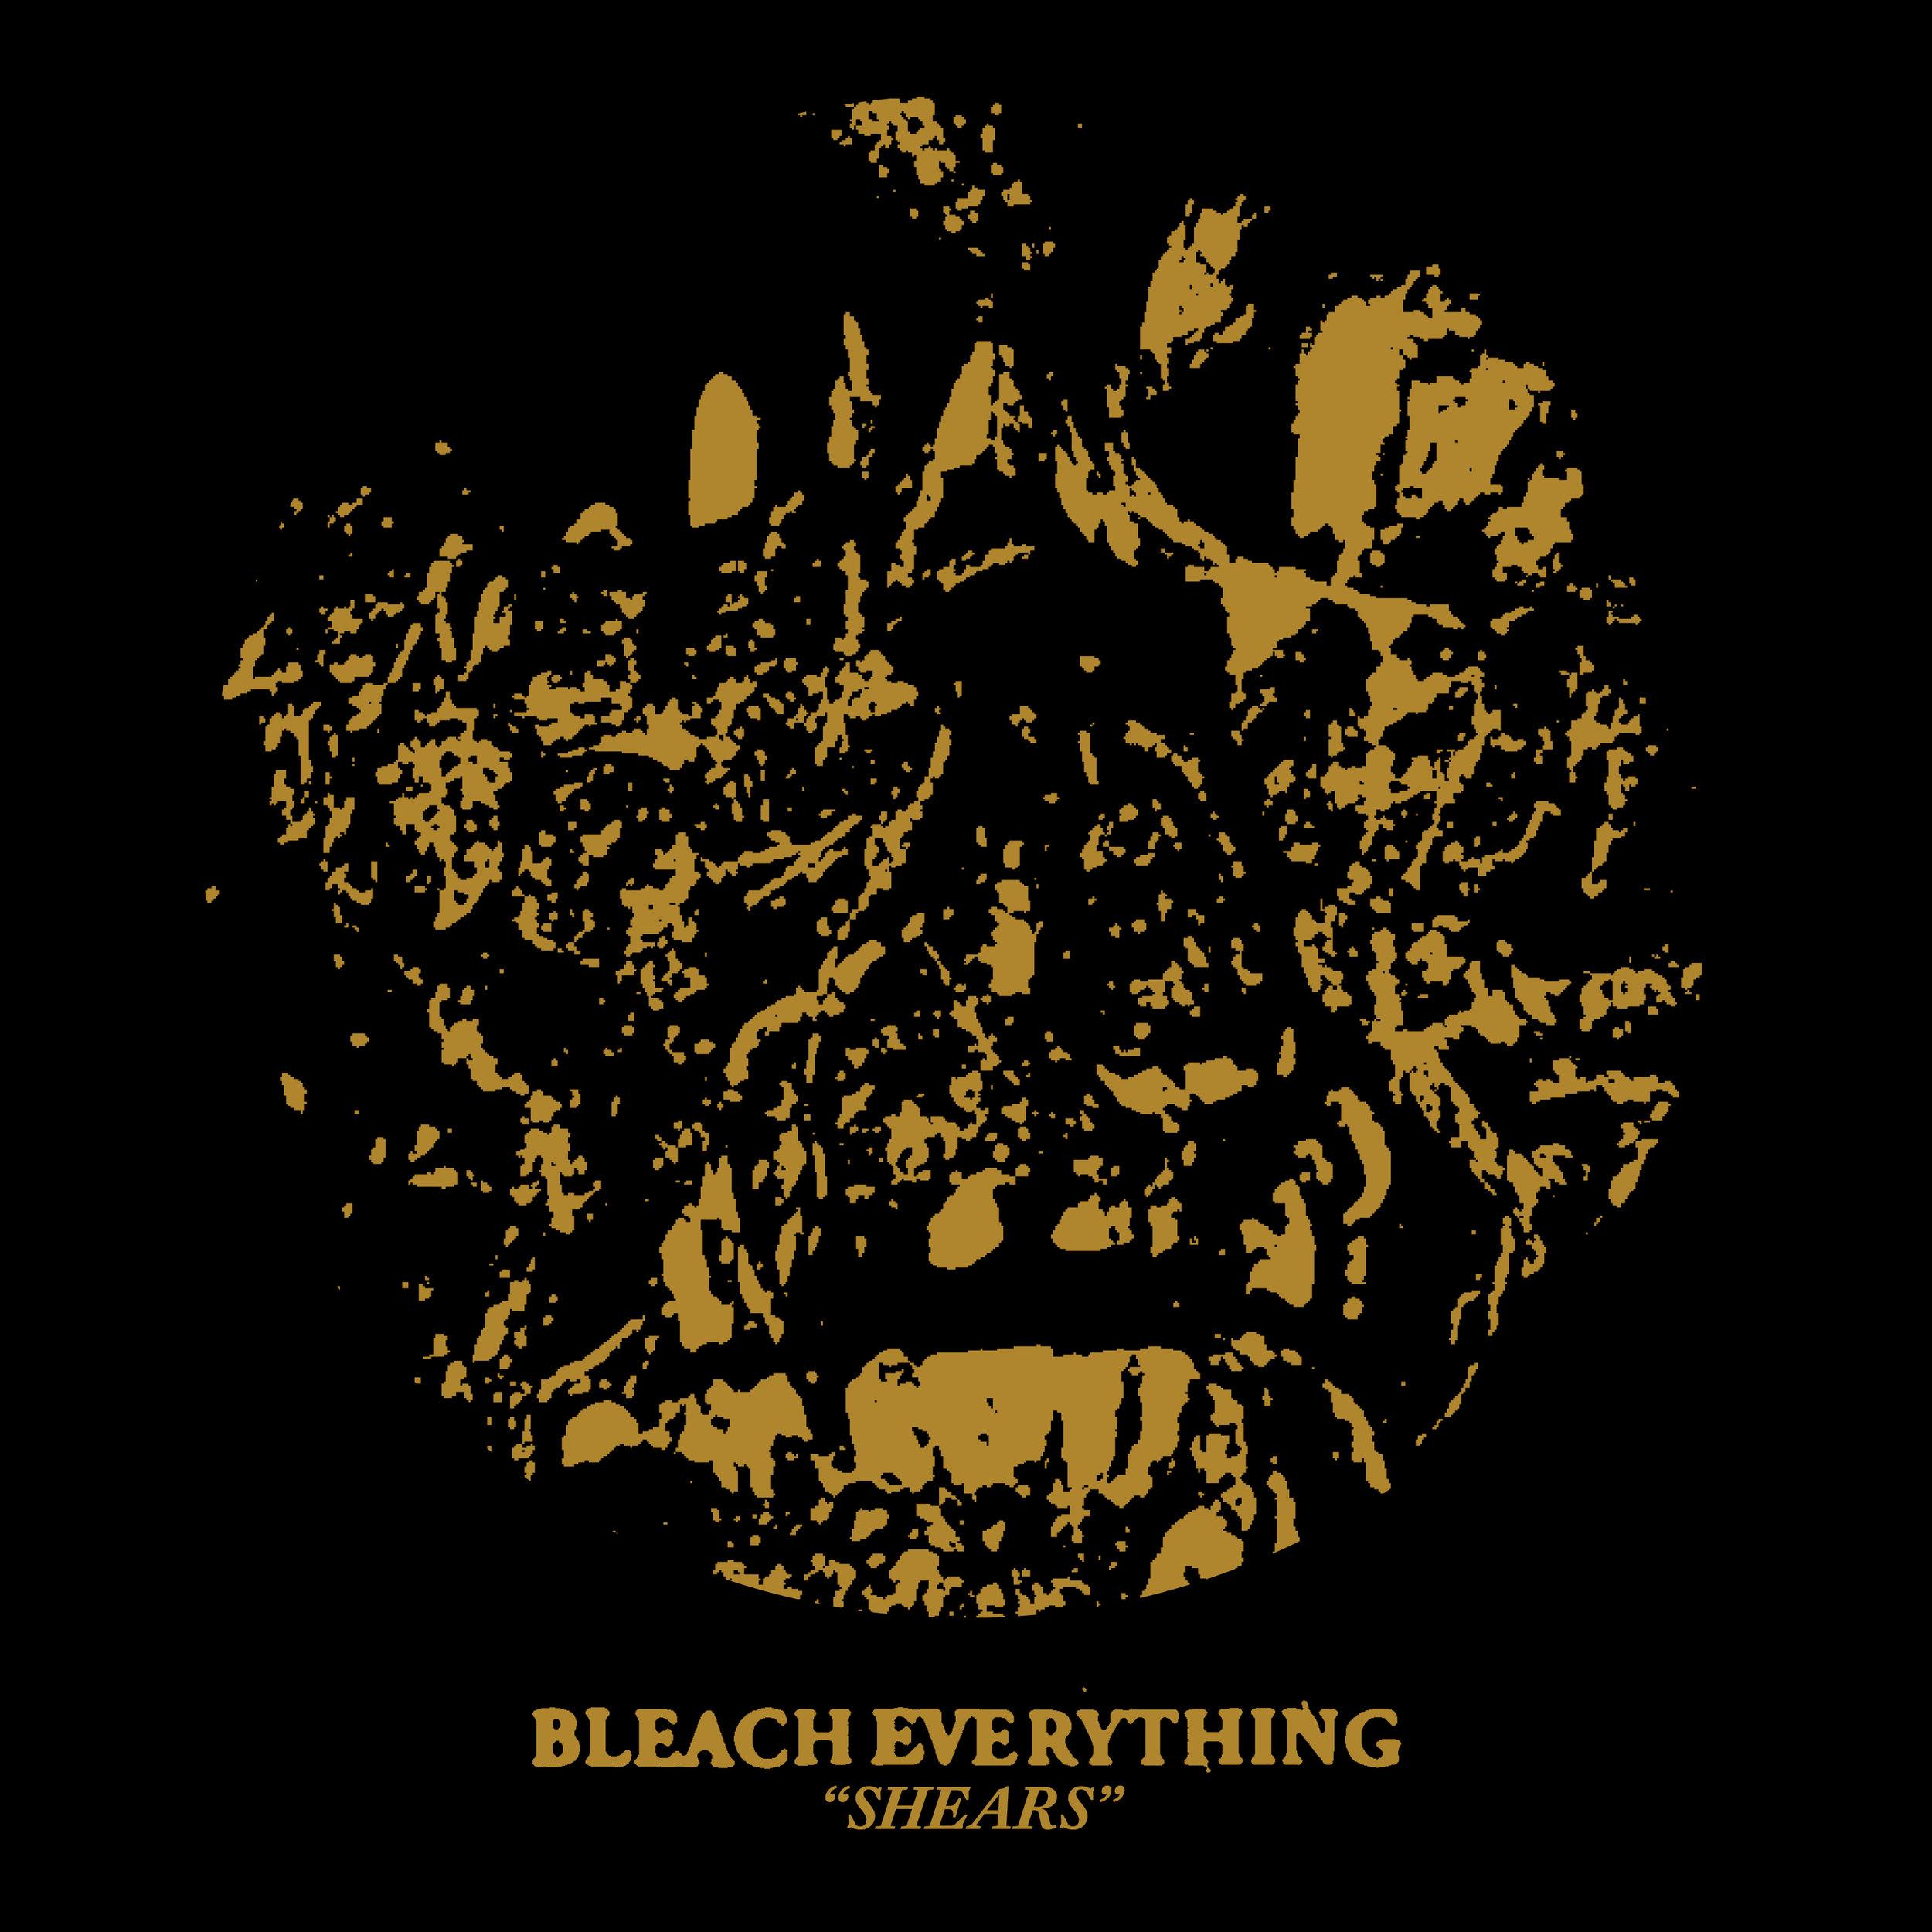 Bleach_Shears_single.jpg